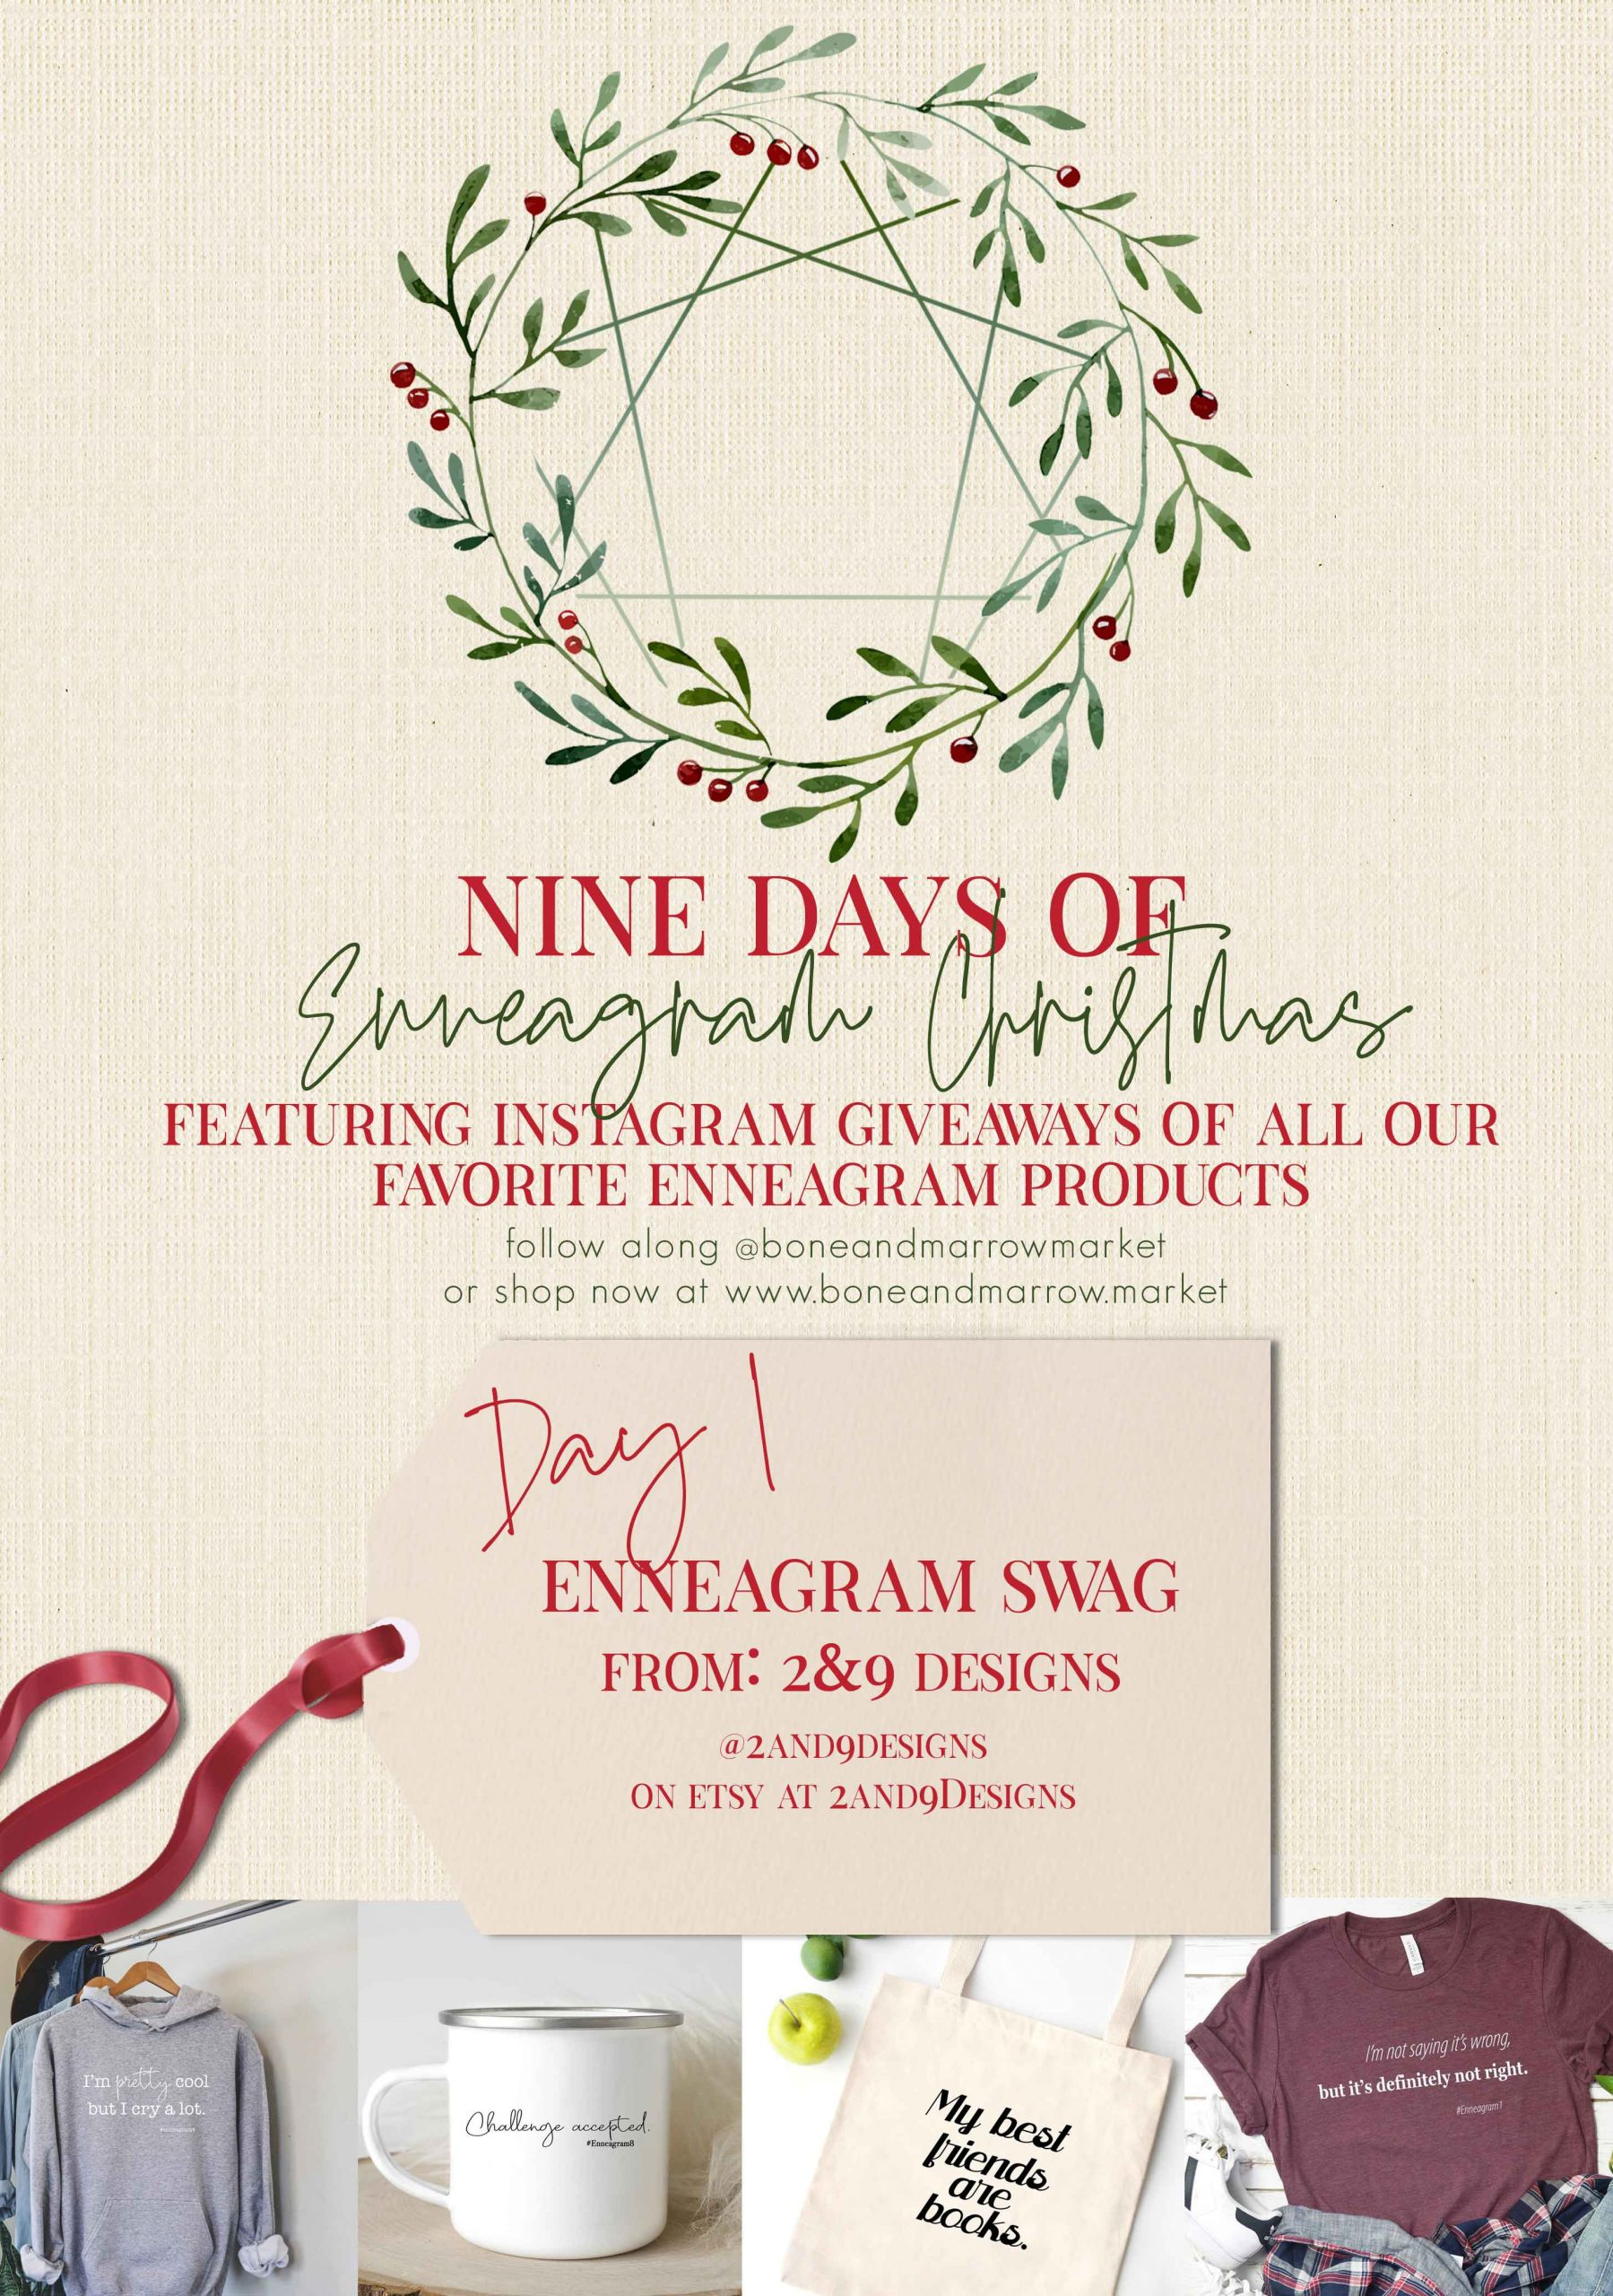 Enneagram Swag 2&9 Designs